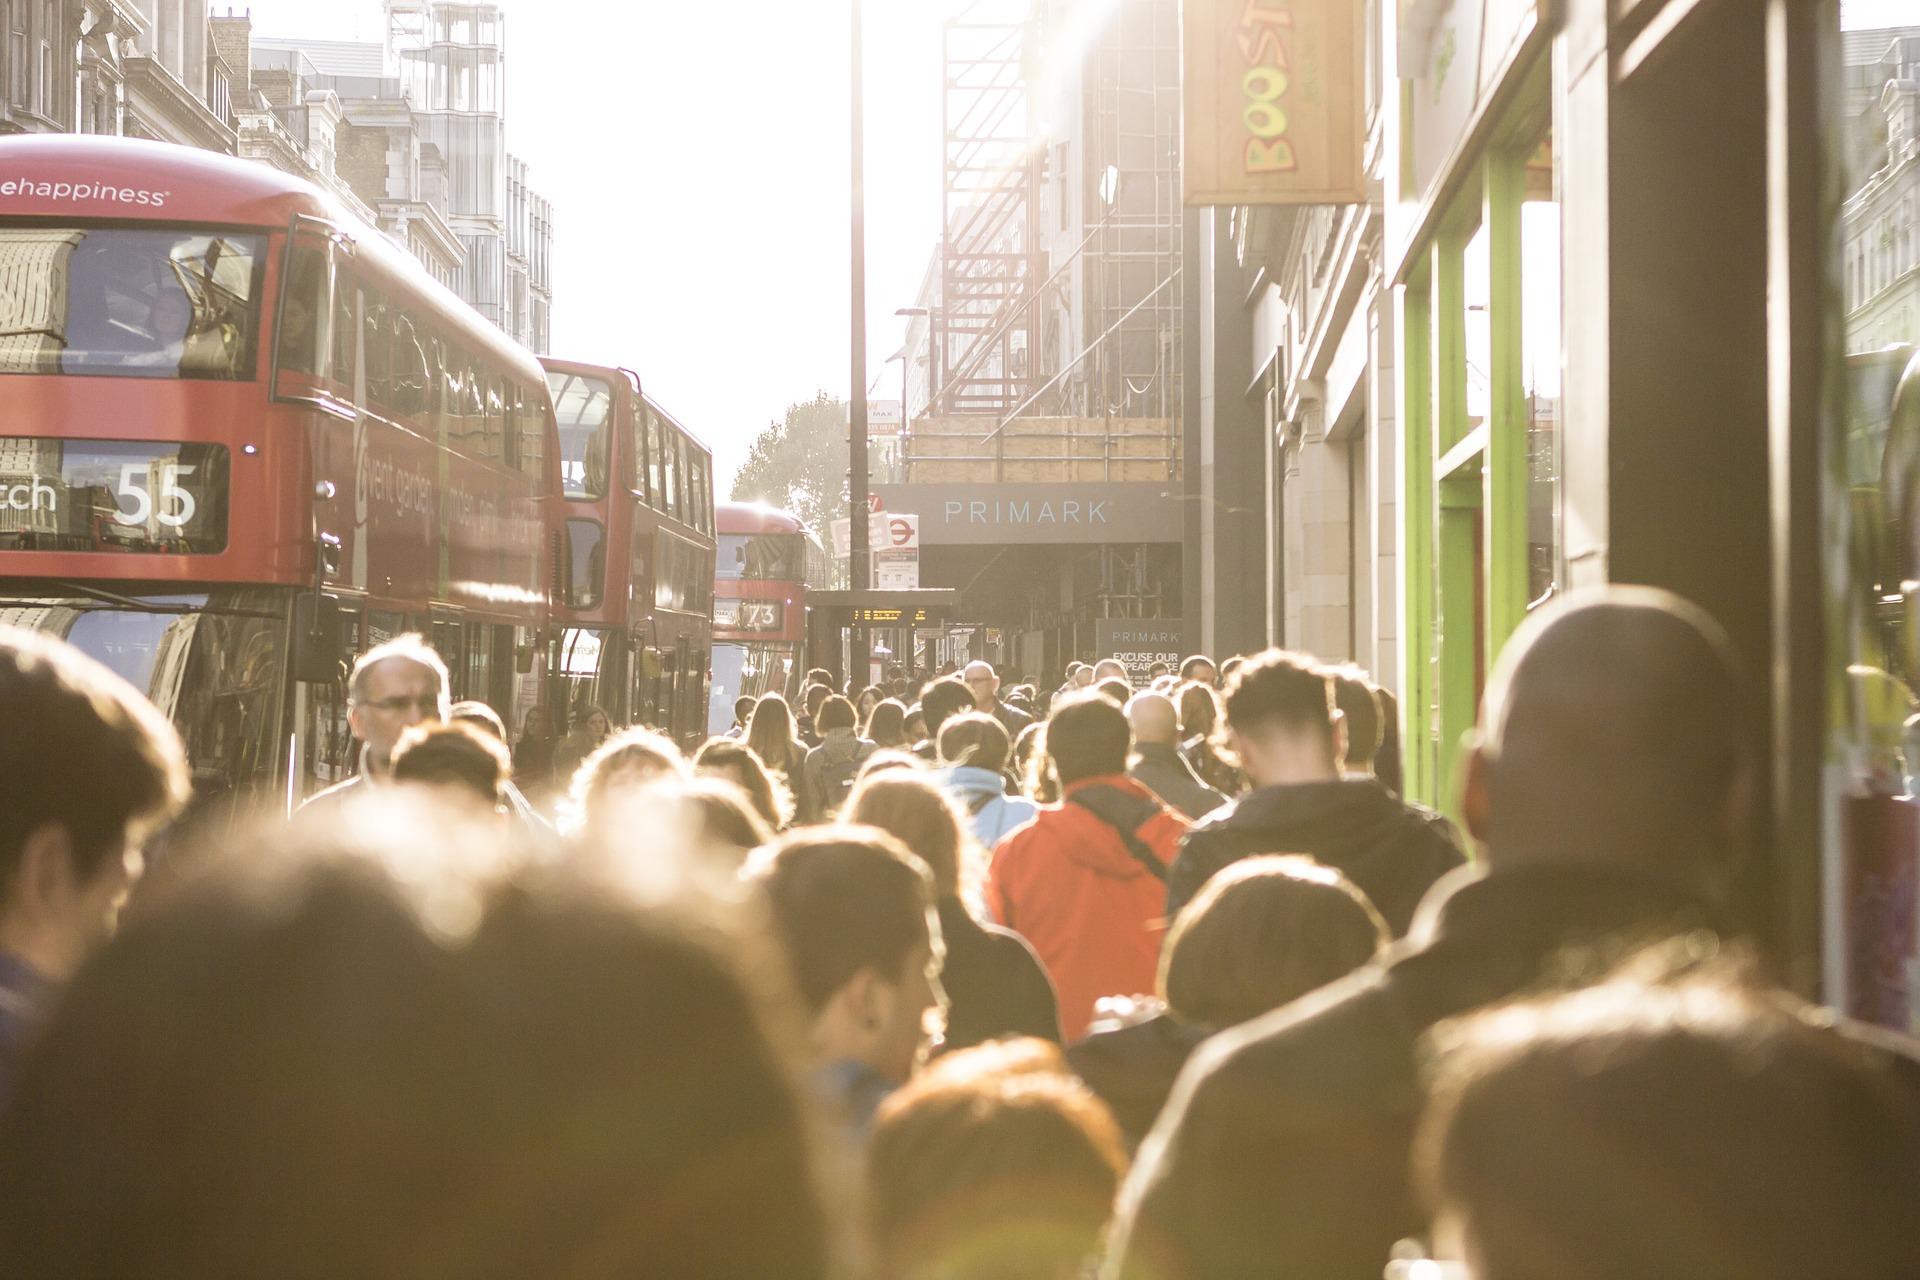 London, People of London, City of London, London Tourists